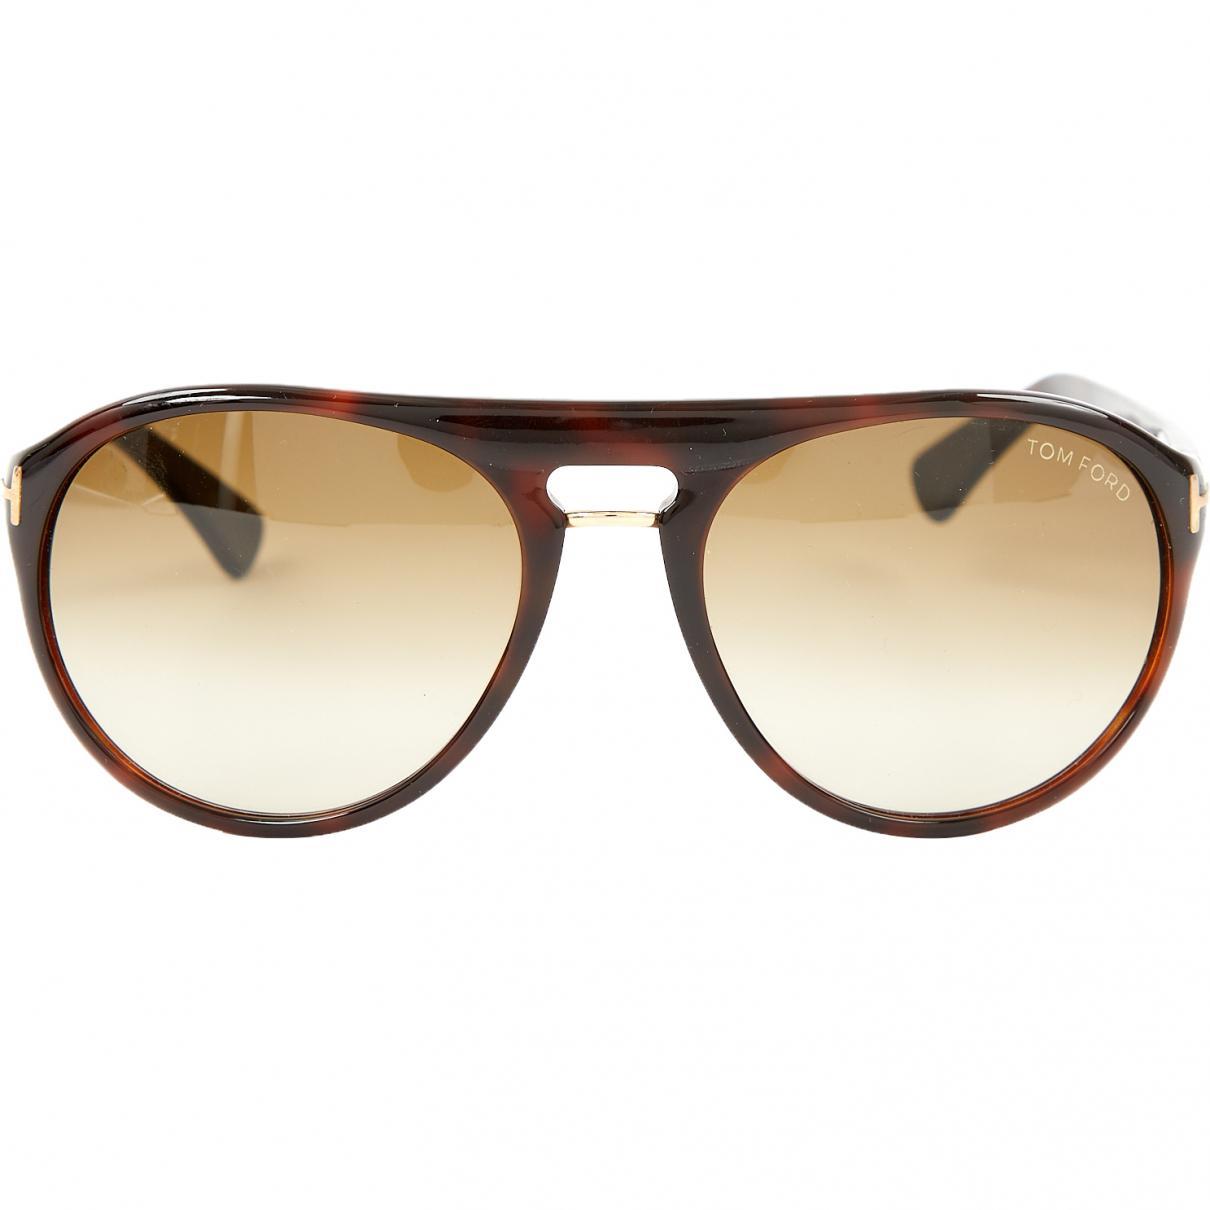 8894aeb7f443 Tom Ford - Brown Sunglasses for Men - Lyst. View fullscreen